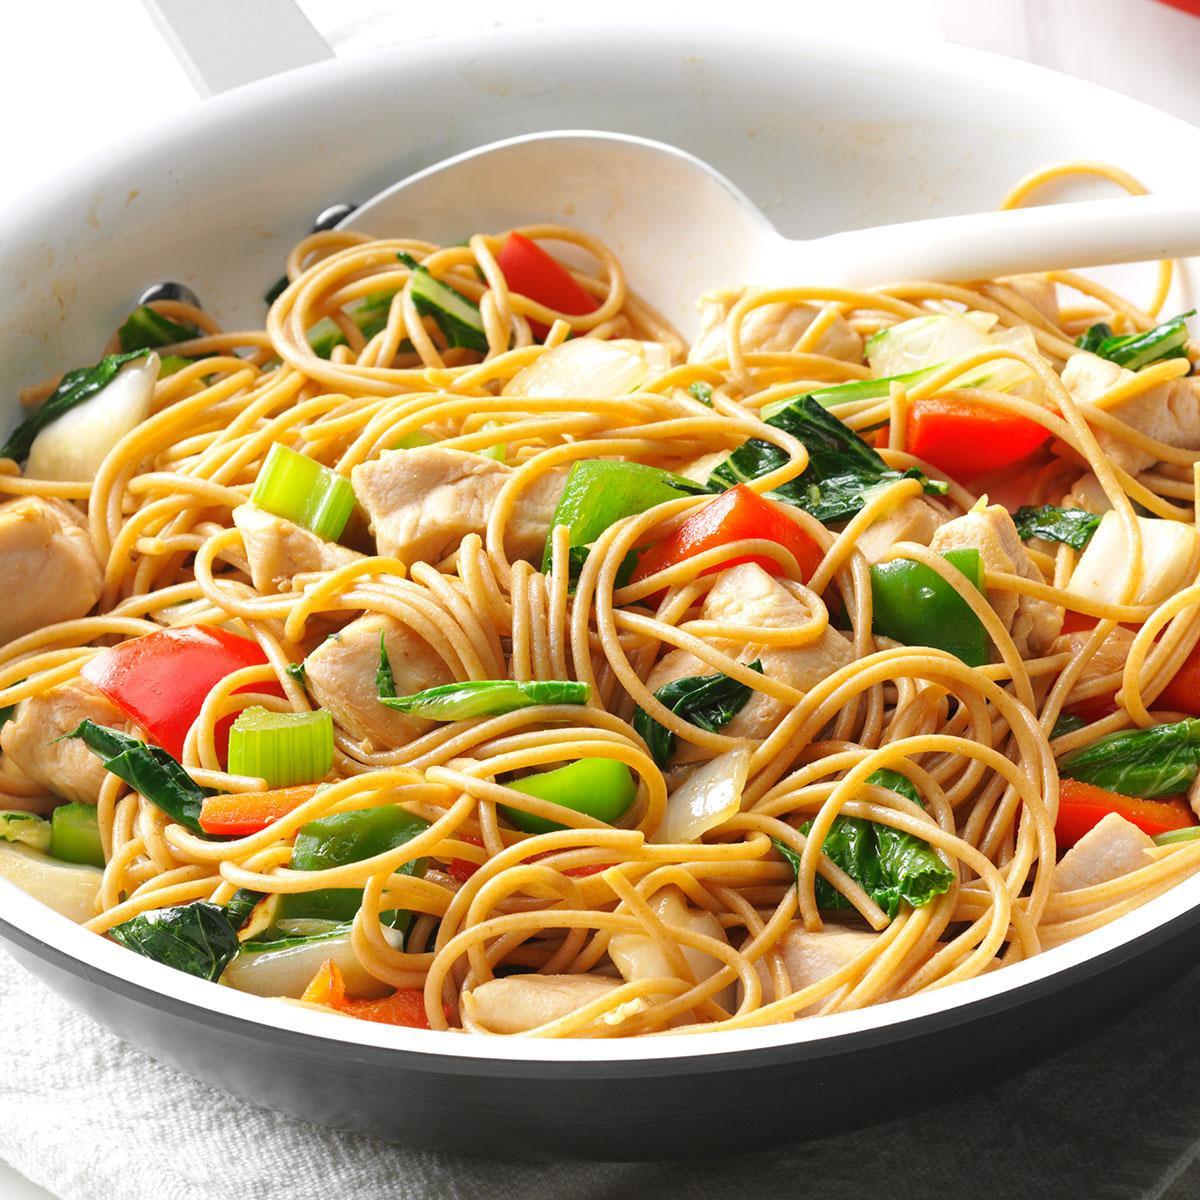 Chicken Noodles Recipe  Chicken Stir Fry with Noodles Recipe